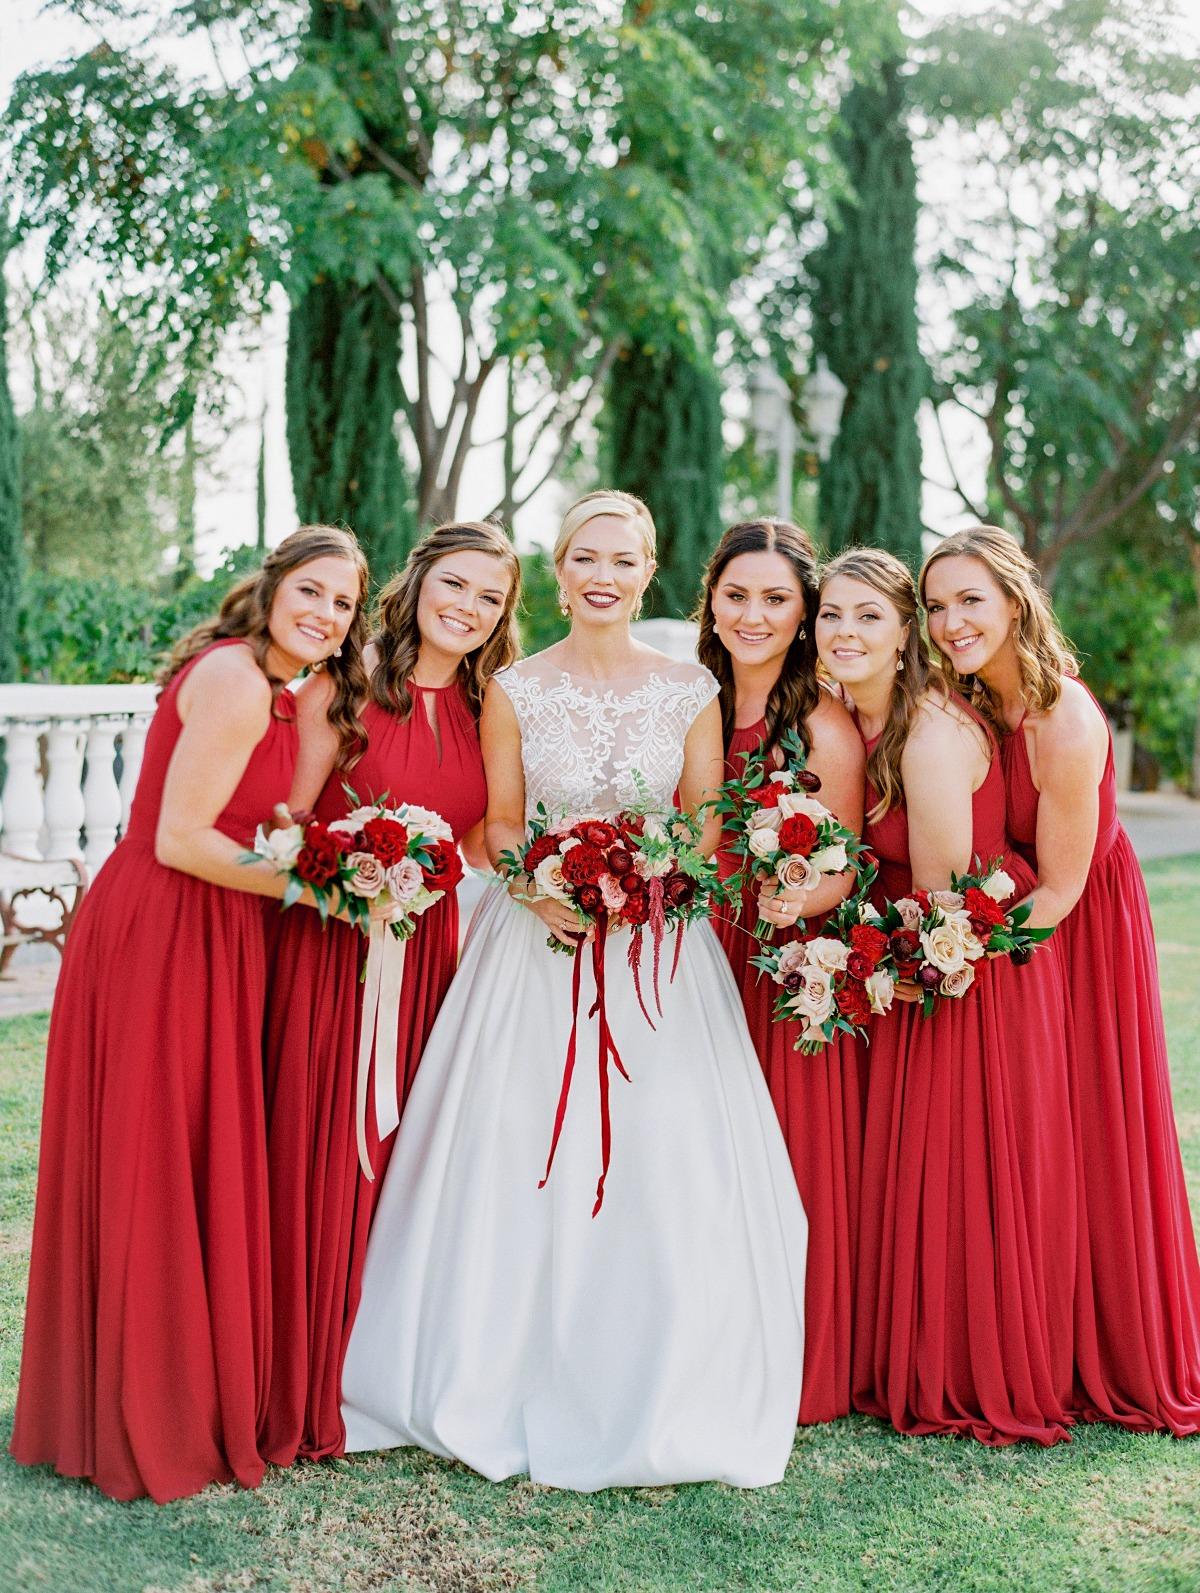 temecula-wedding-planner6.jpg